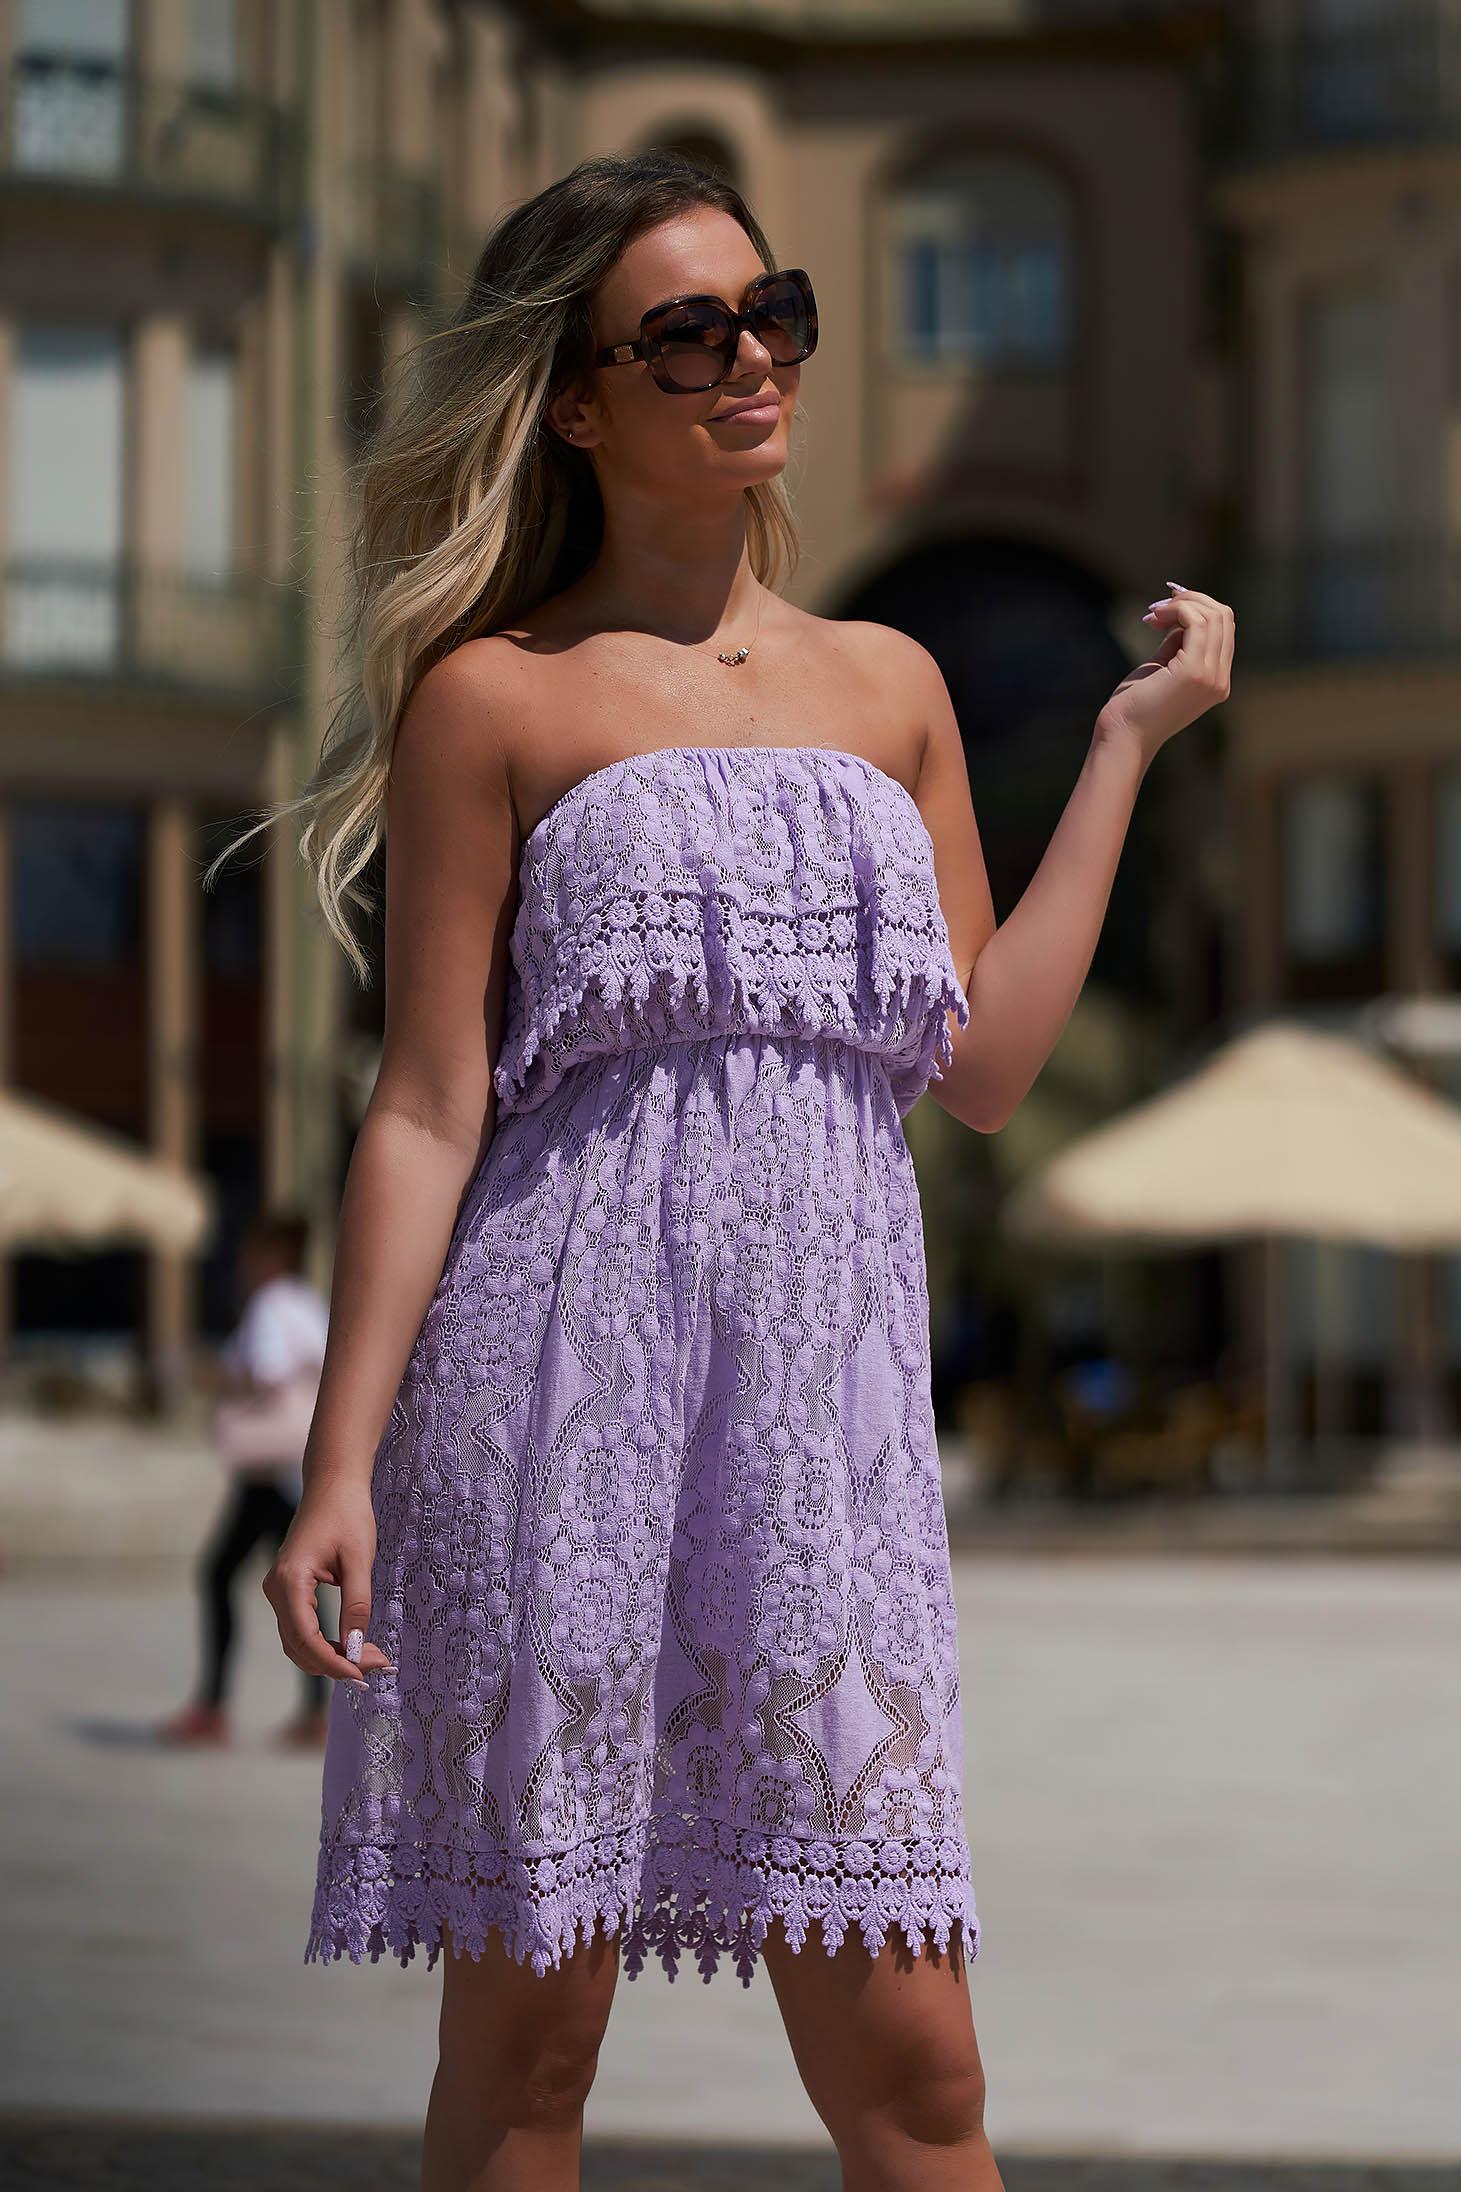 Lila dress daily short cut straight off-shoulder cotton